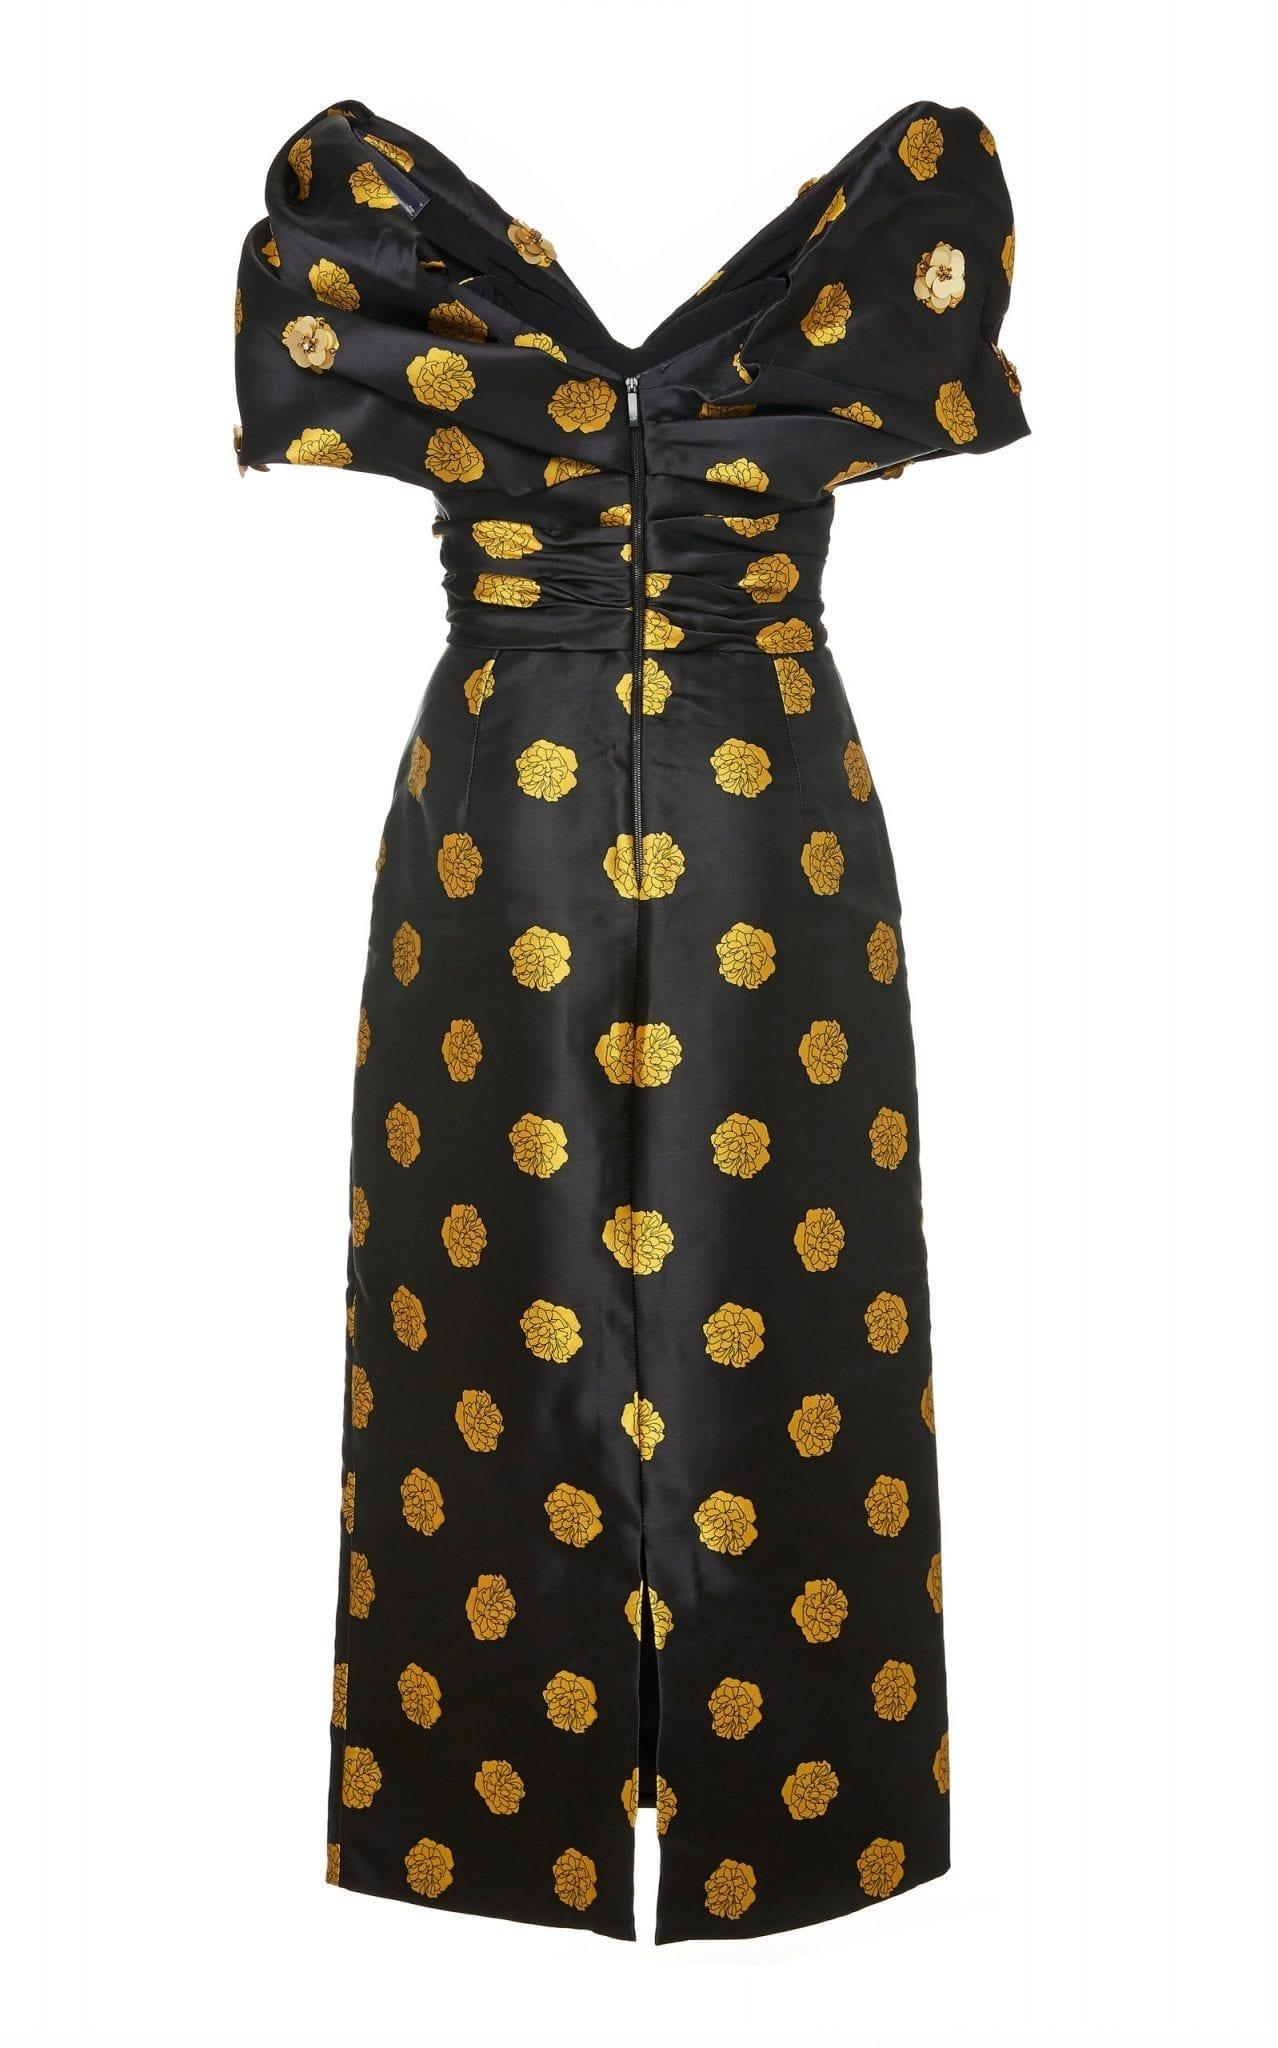 JOHANNA ORTIZ Exclusive Golden Phase Embellished Taffeta Dress